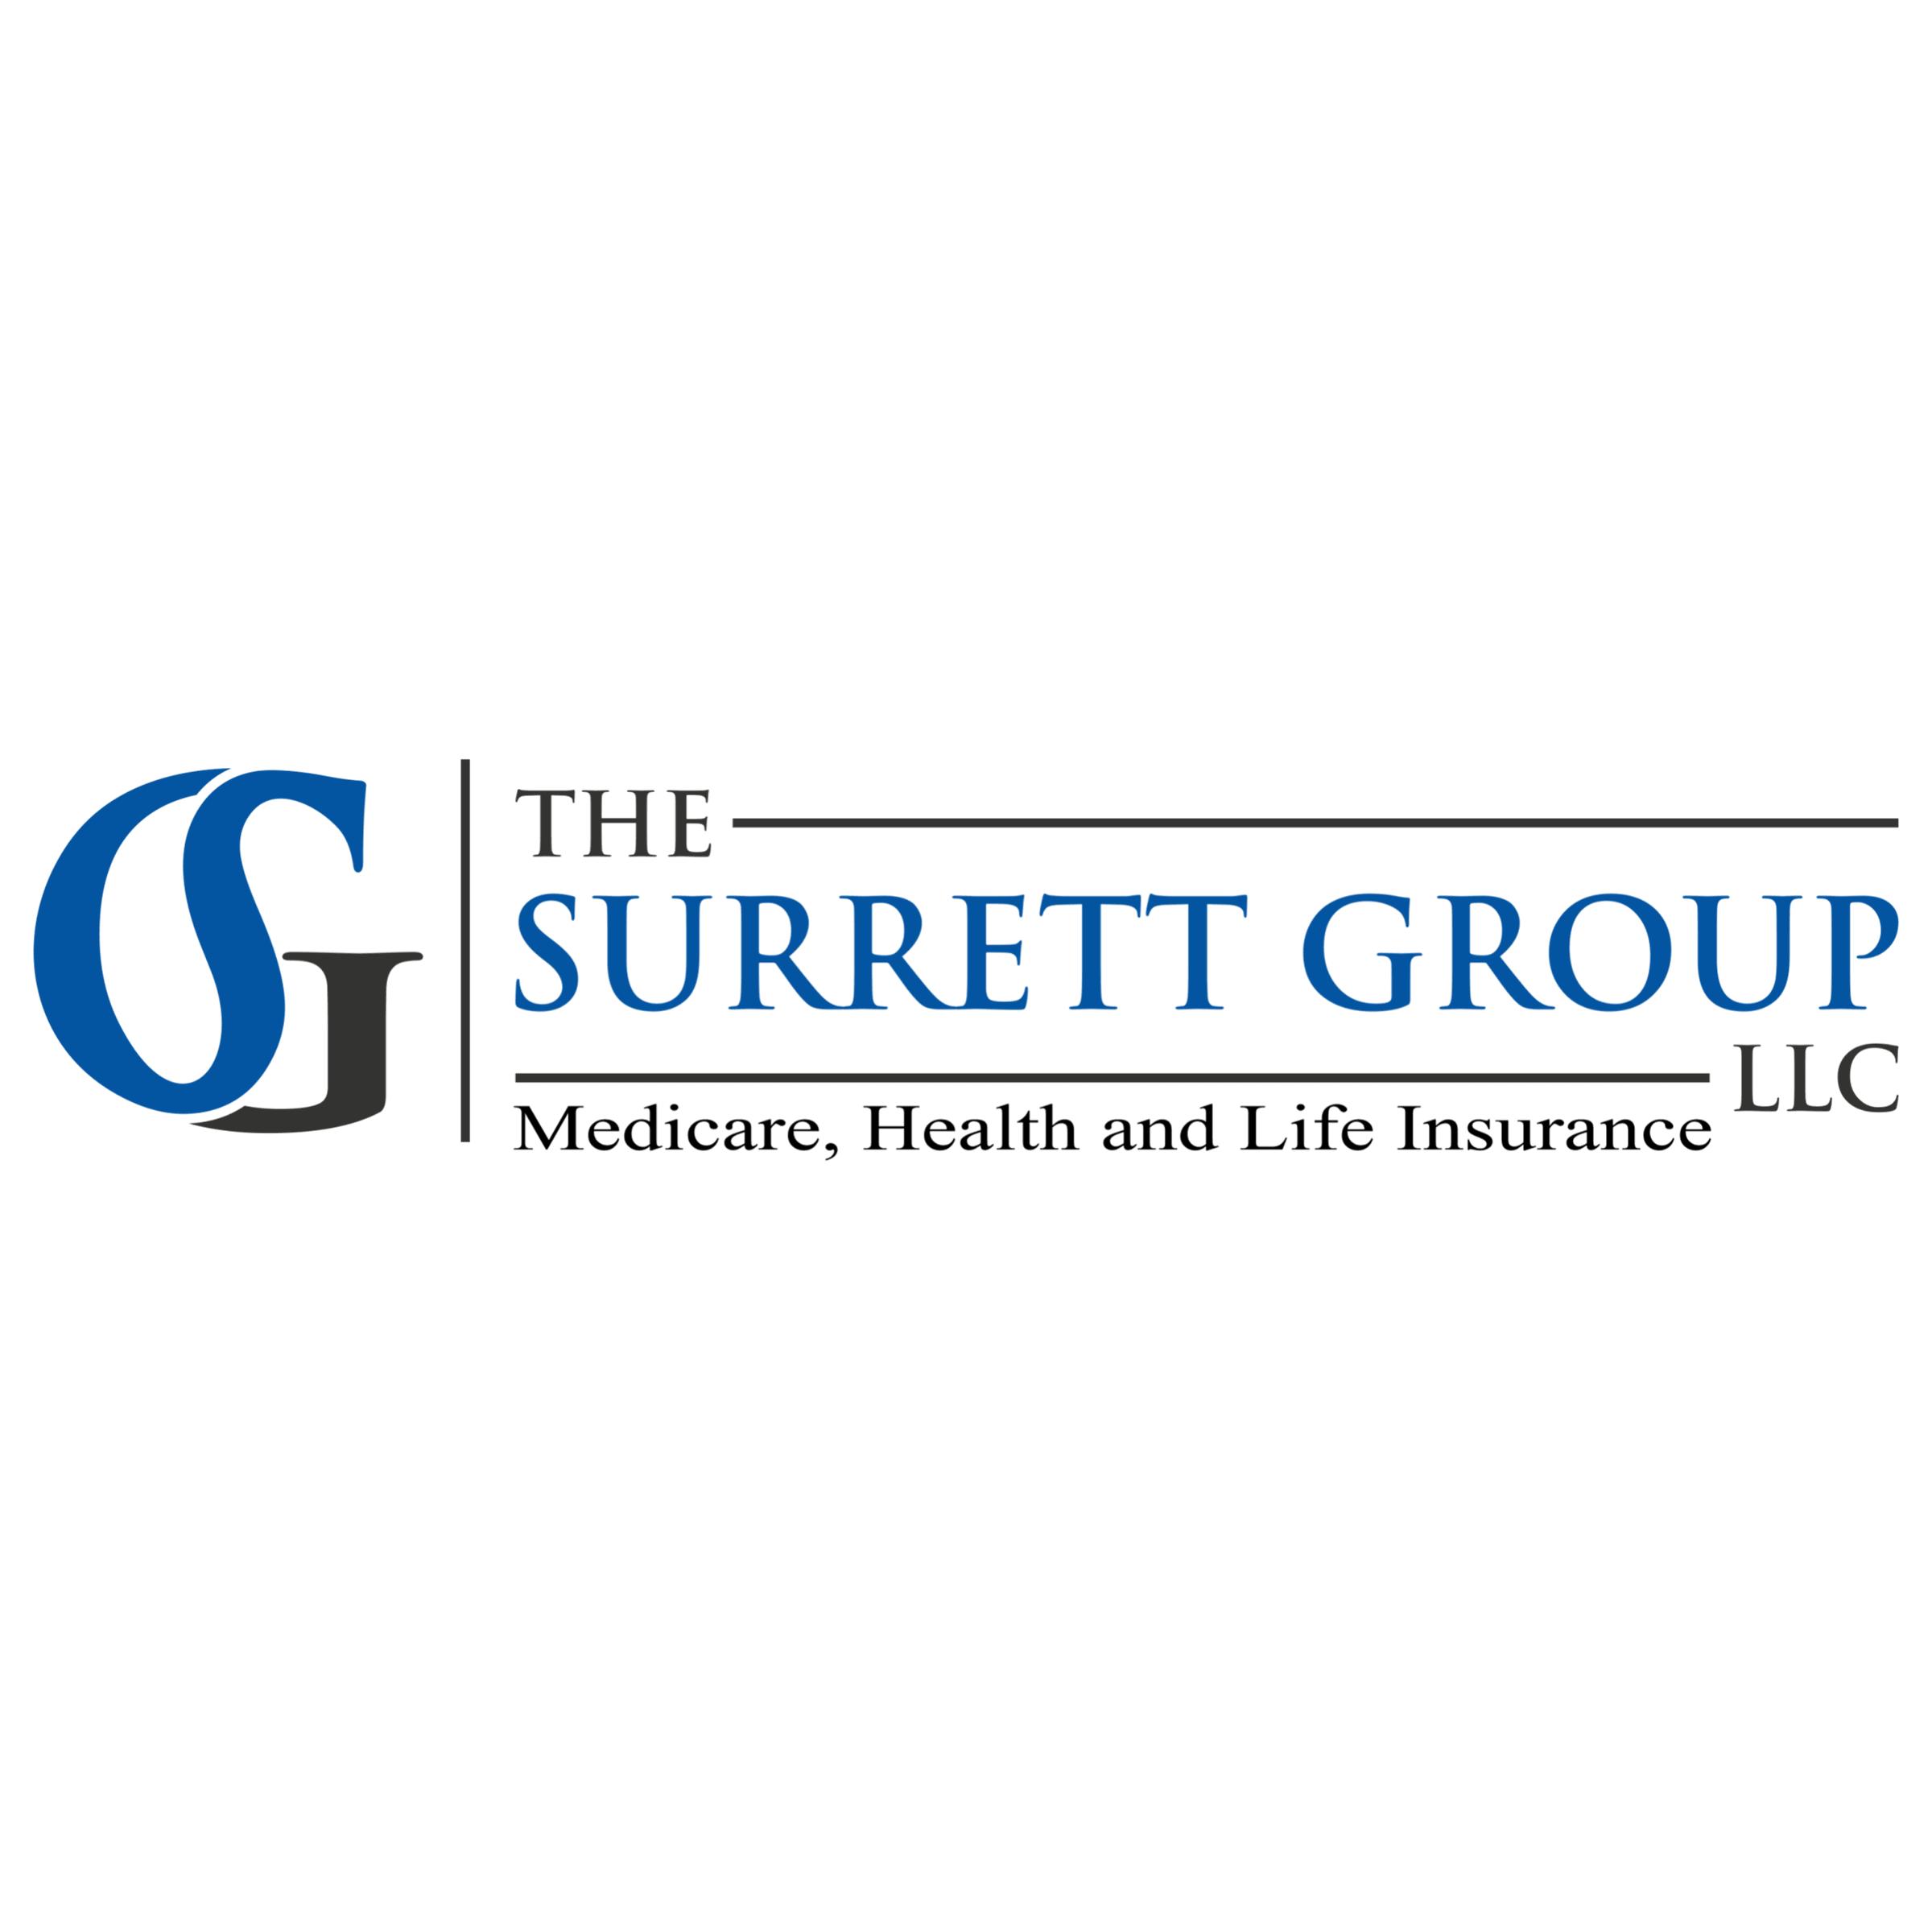 The Surrett Group